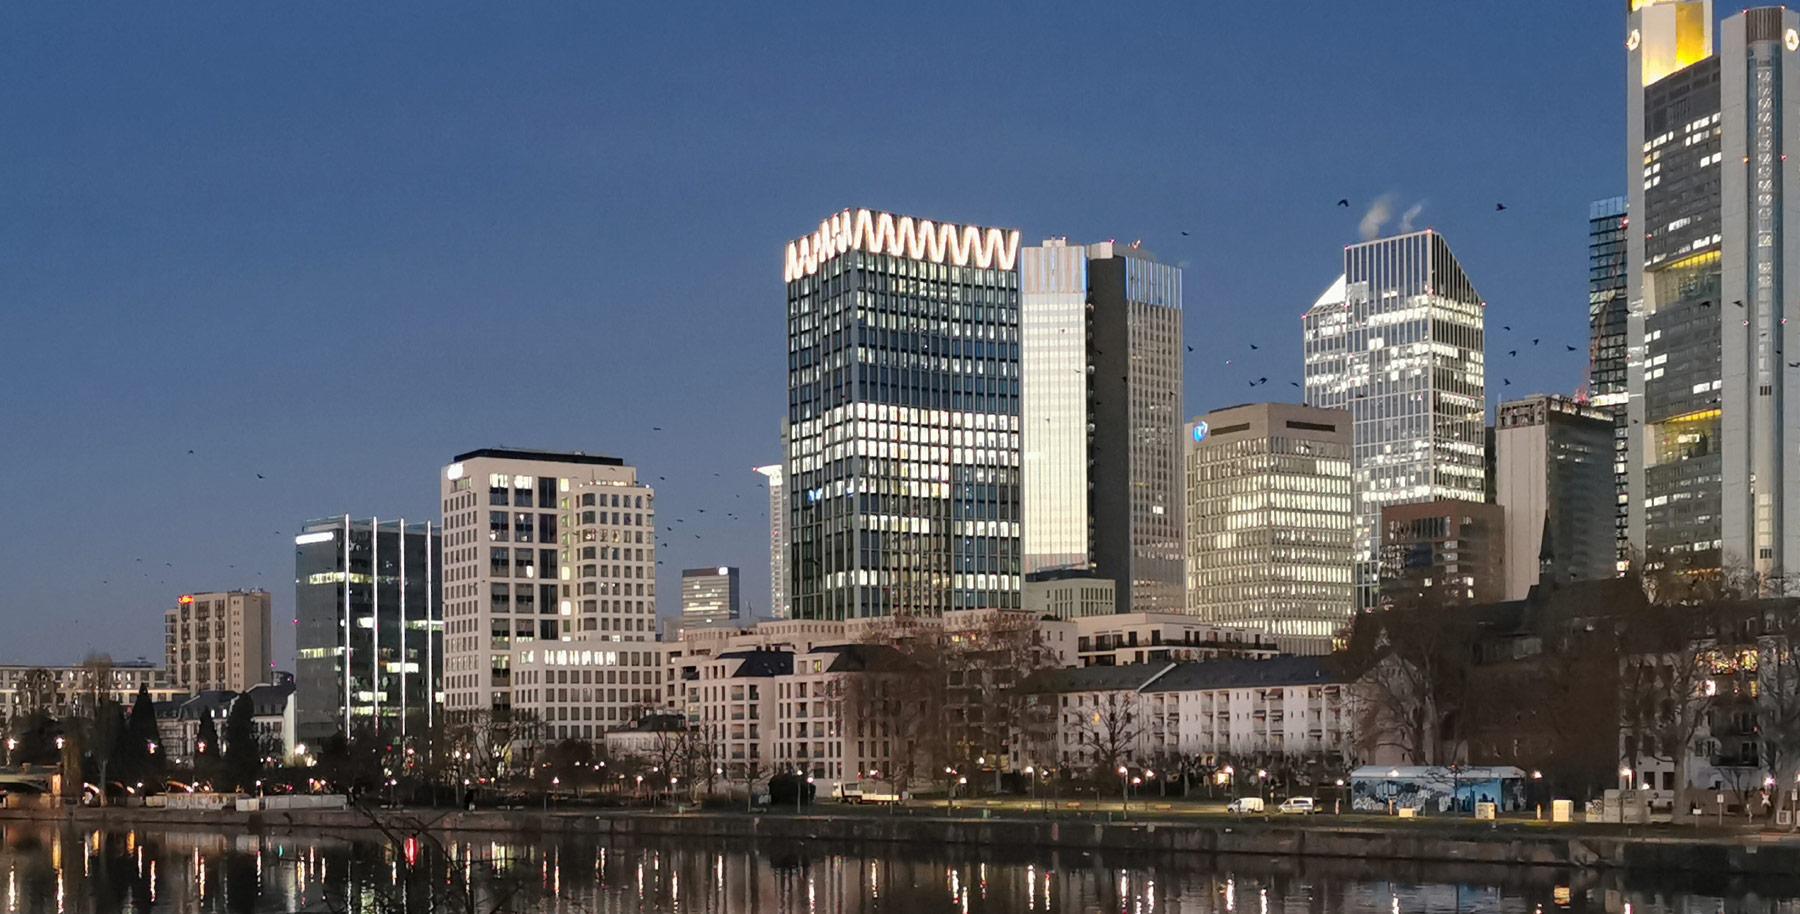 Winx Frankfurt - MainTor project